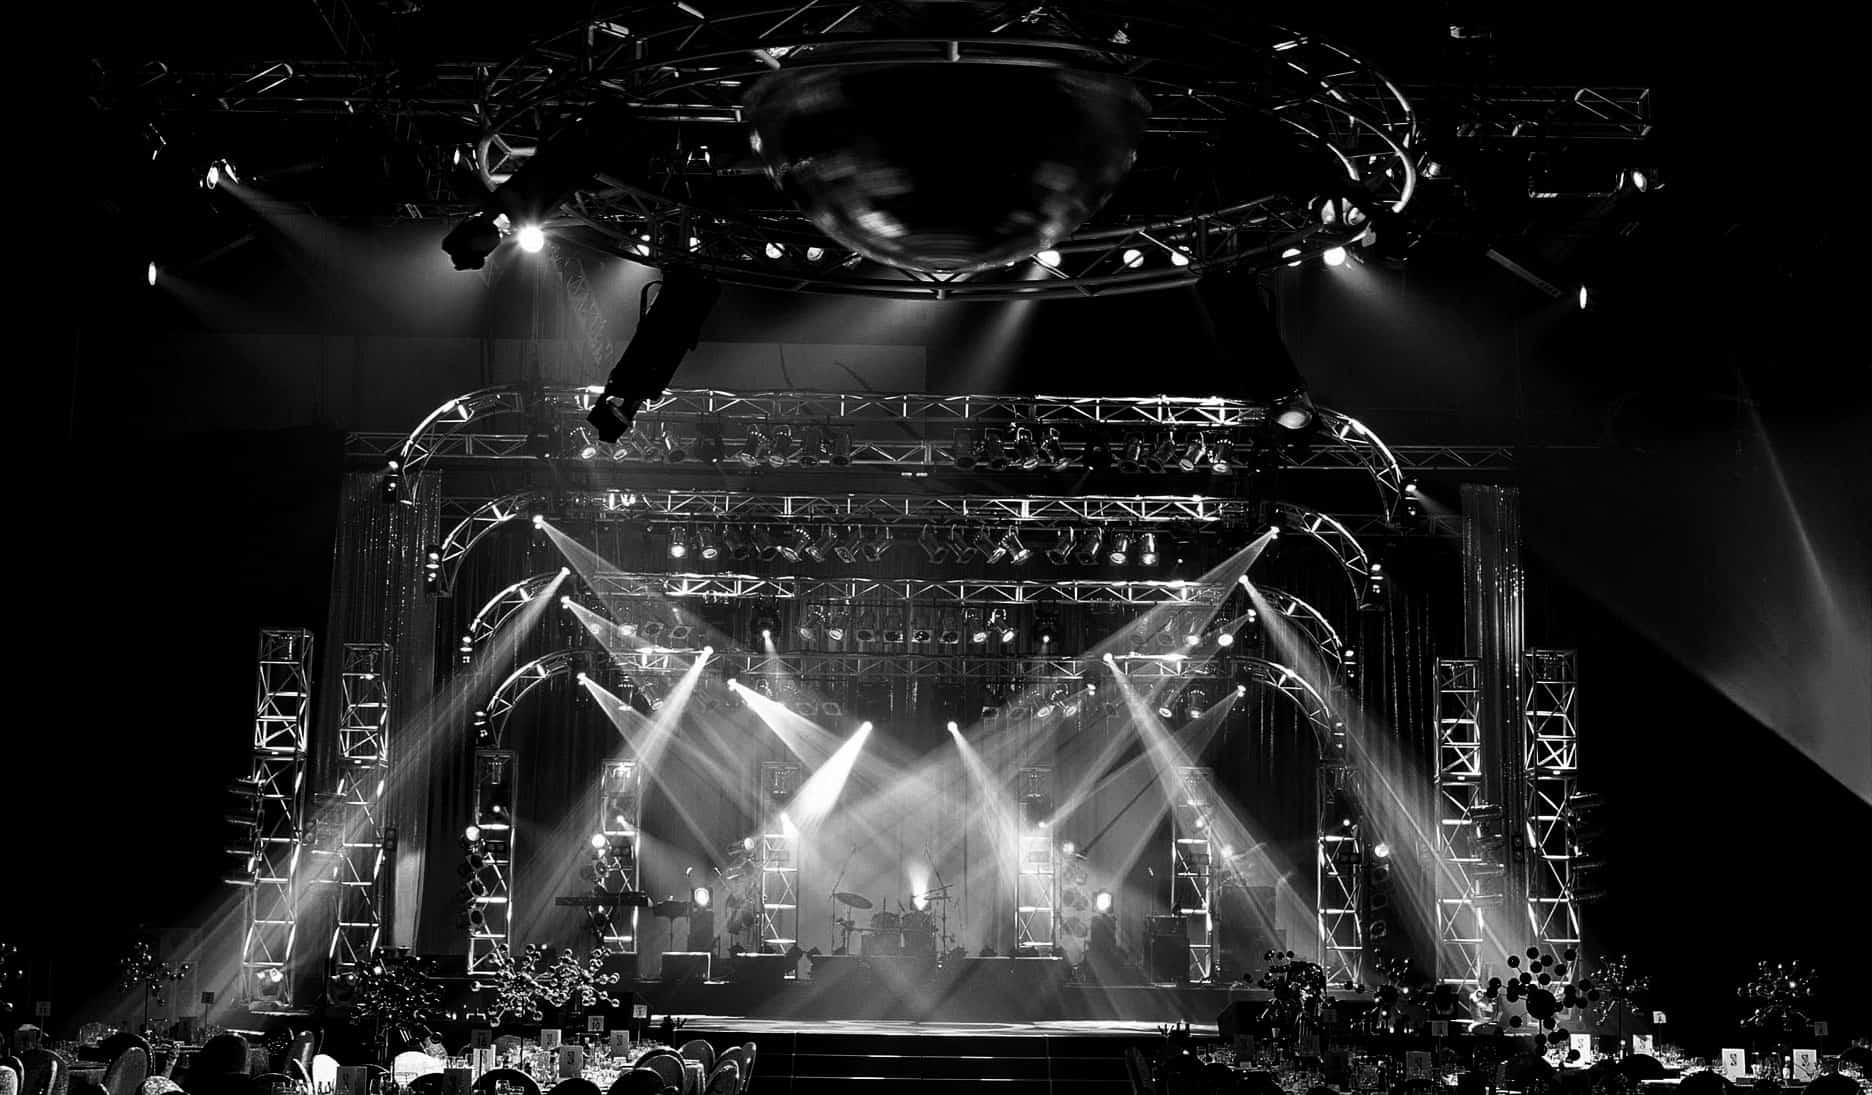 Concert, Mac Aura, Audio Visual Production, AV Production, Truss, Moving Heads, Martin MH3 Beam, LED Screen, Line Array